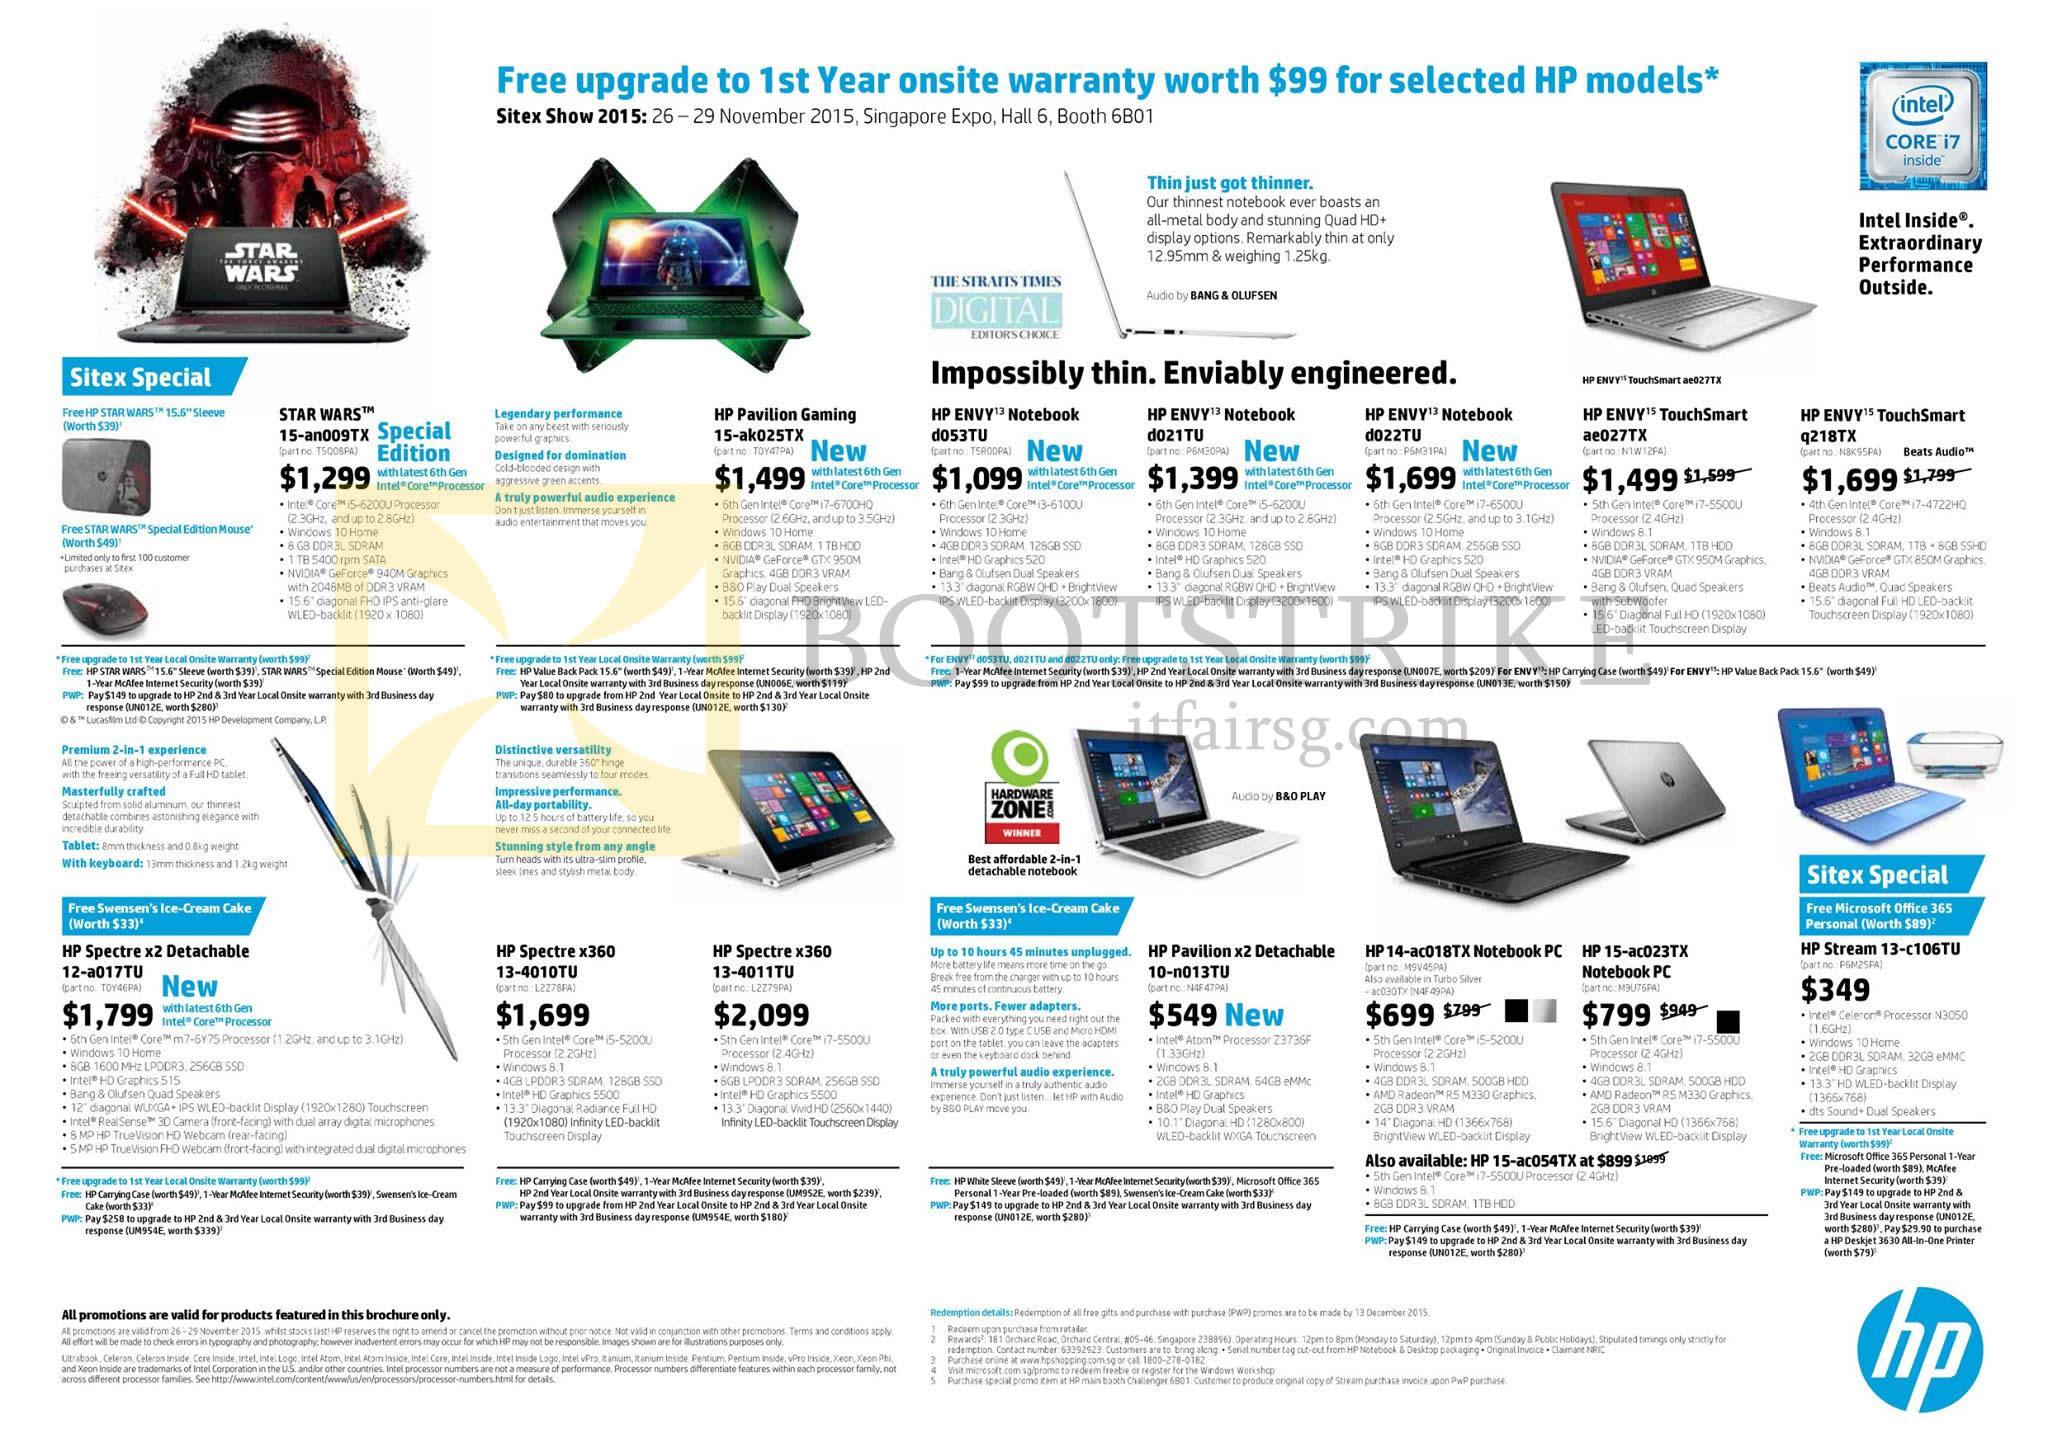 SITEX 2015 price list image brochure of HP Notebooks Star Wars 15-an009TX, Envy 13-d053TU, 13-d021TU, 13-d022TU, Spectre X360 13-4010TU, X2 Detachable 10-n013TU, 15-ac023TX